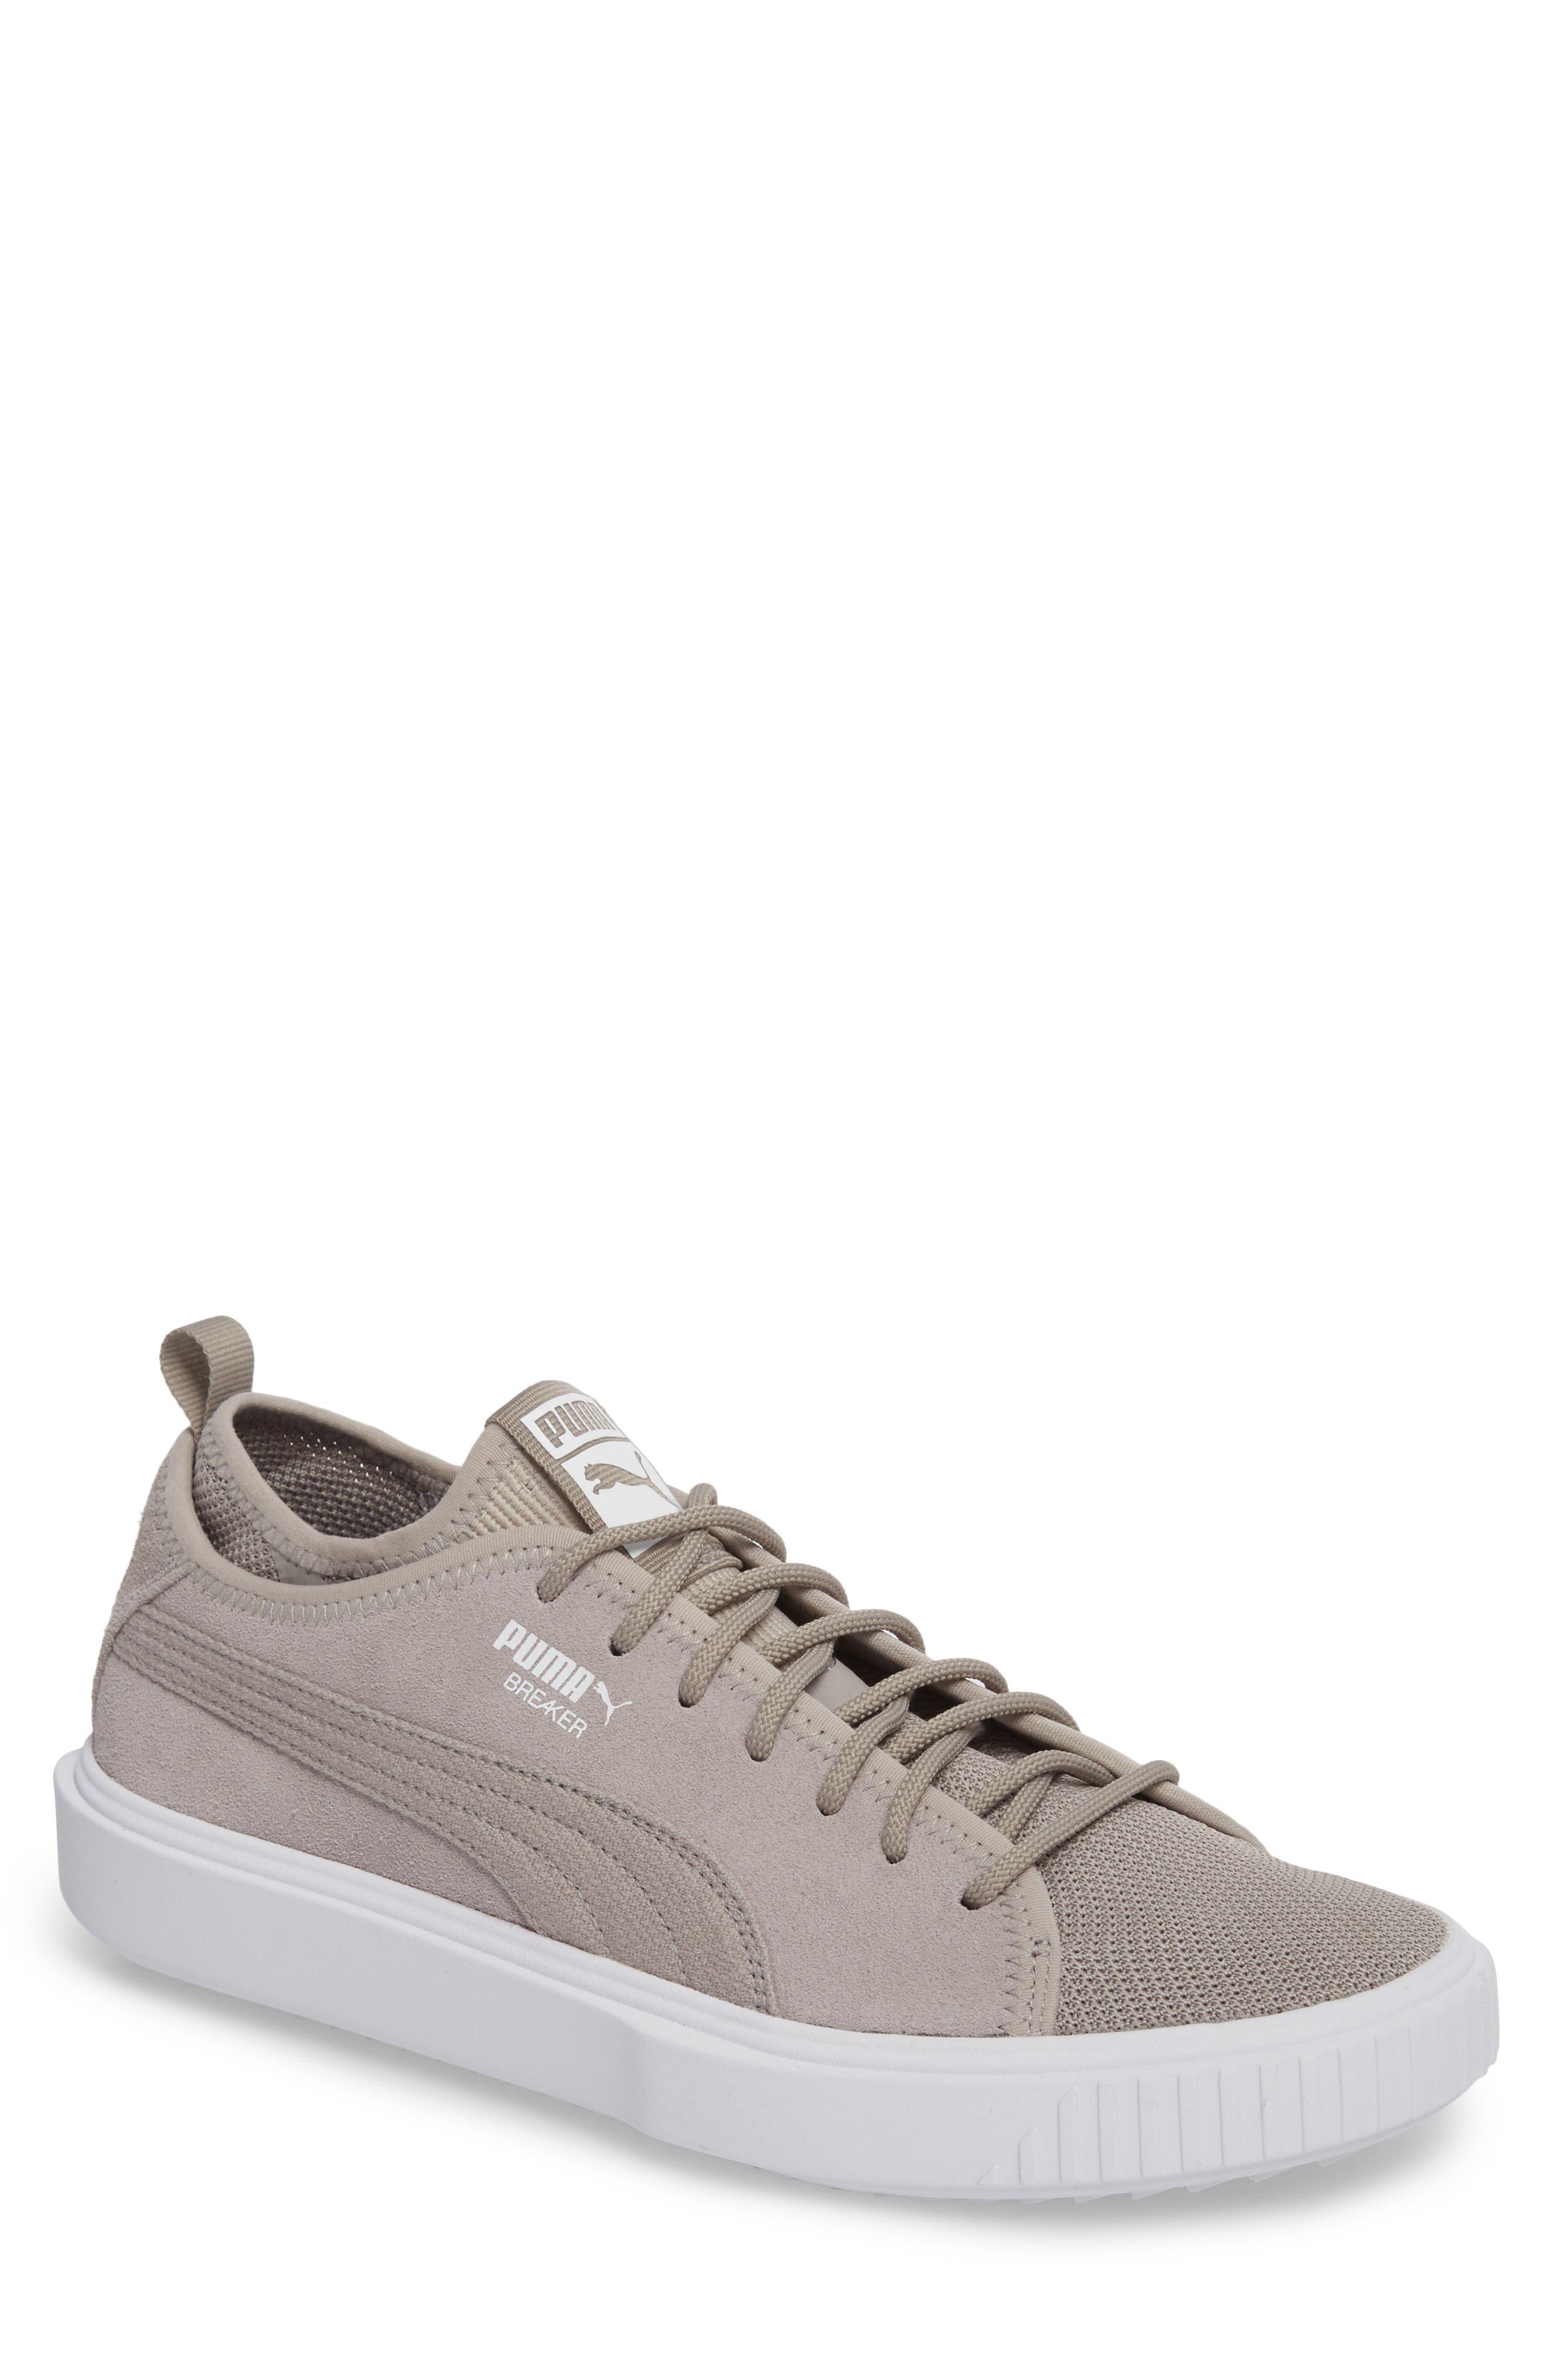 Breaker Mesh Sneaker,                         Main,                         color, Ash/ White Suede